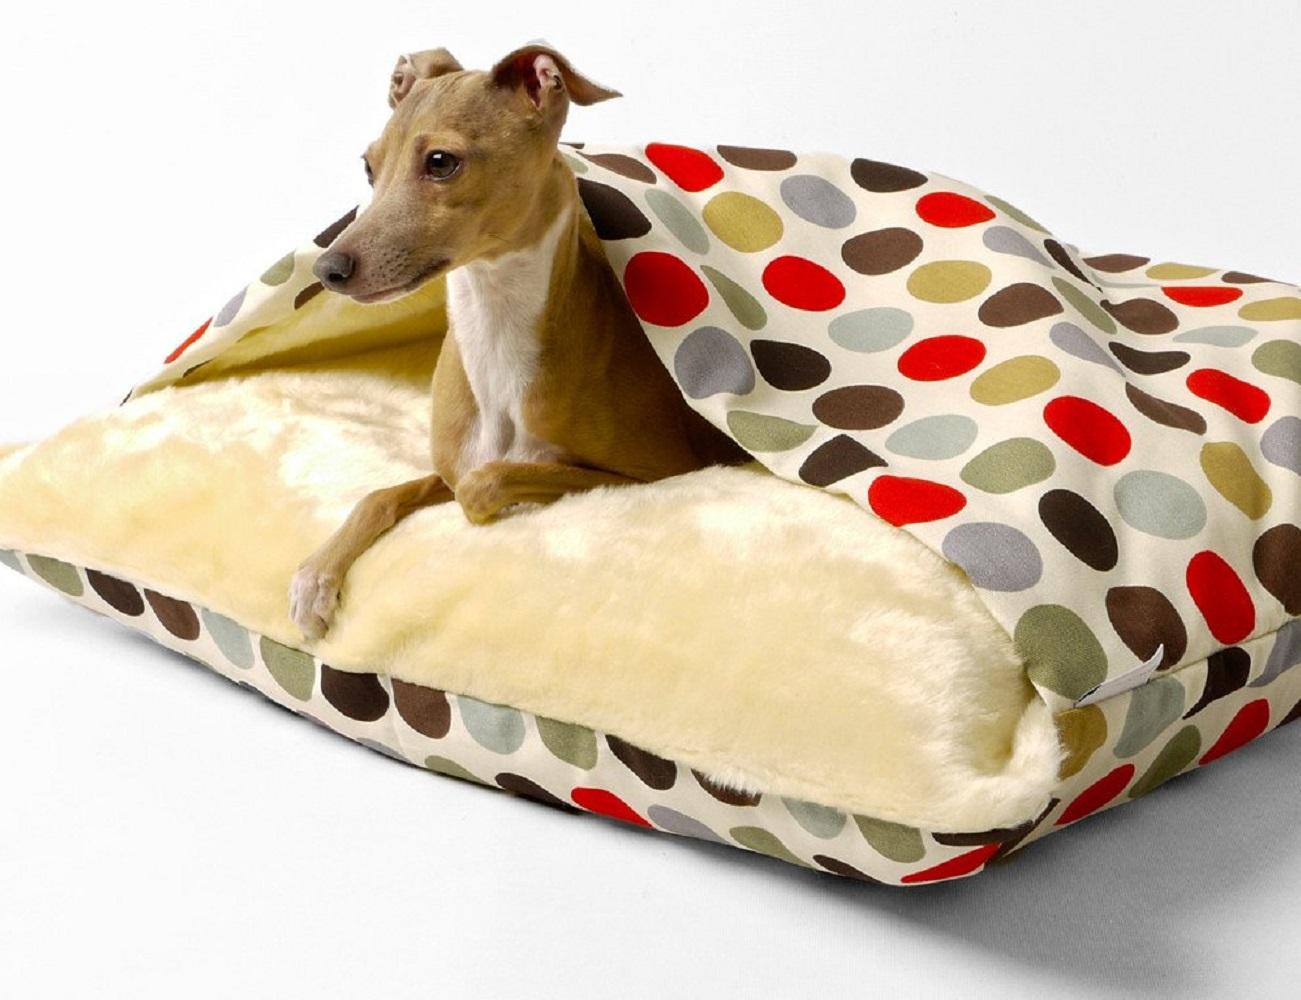 Snuggle Pet Bed by Charley Chau